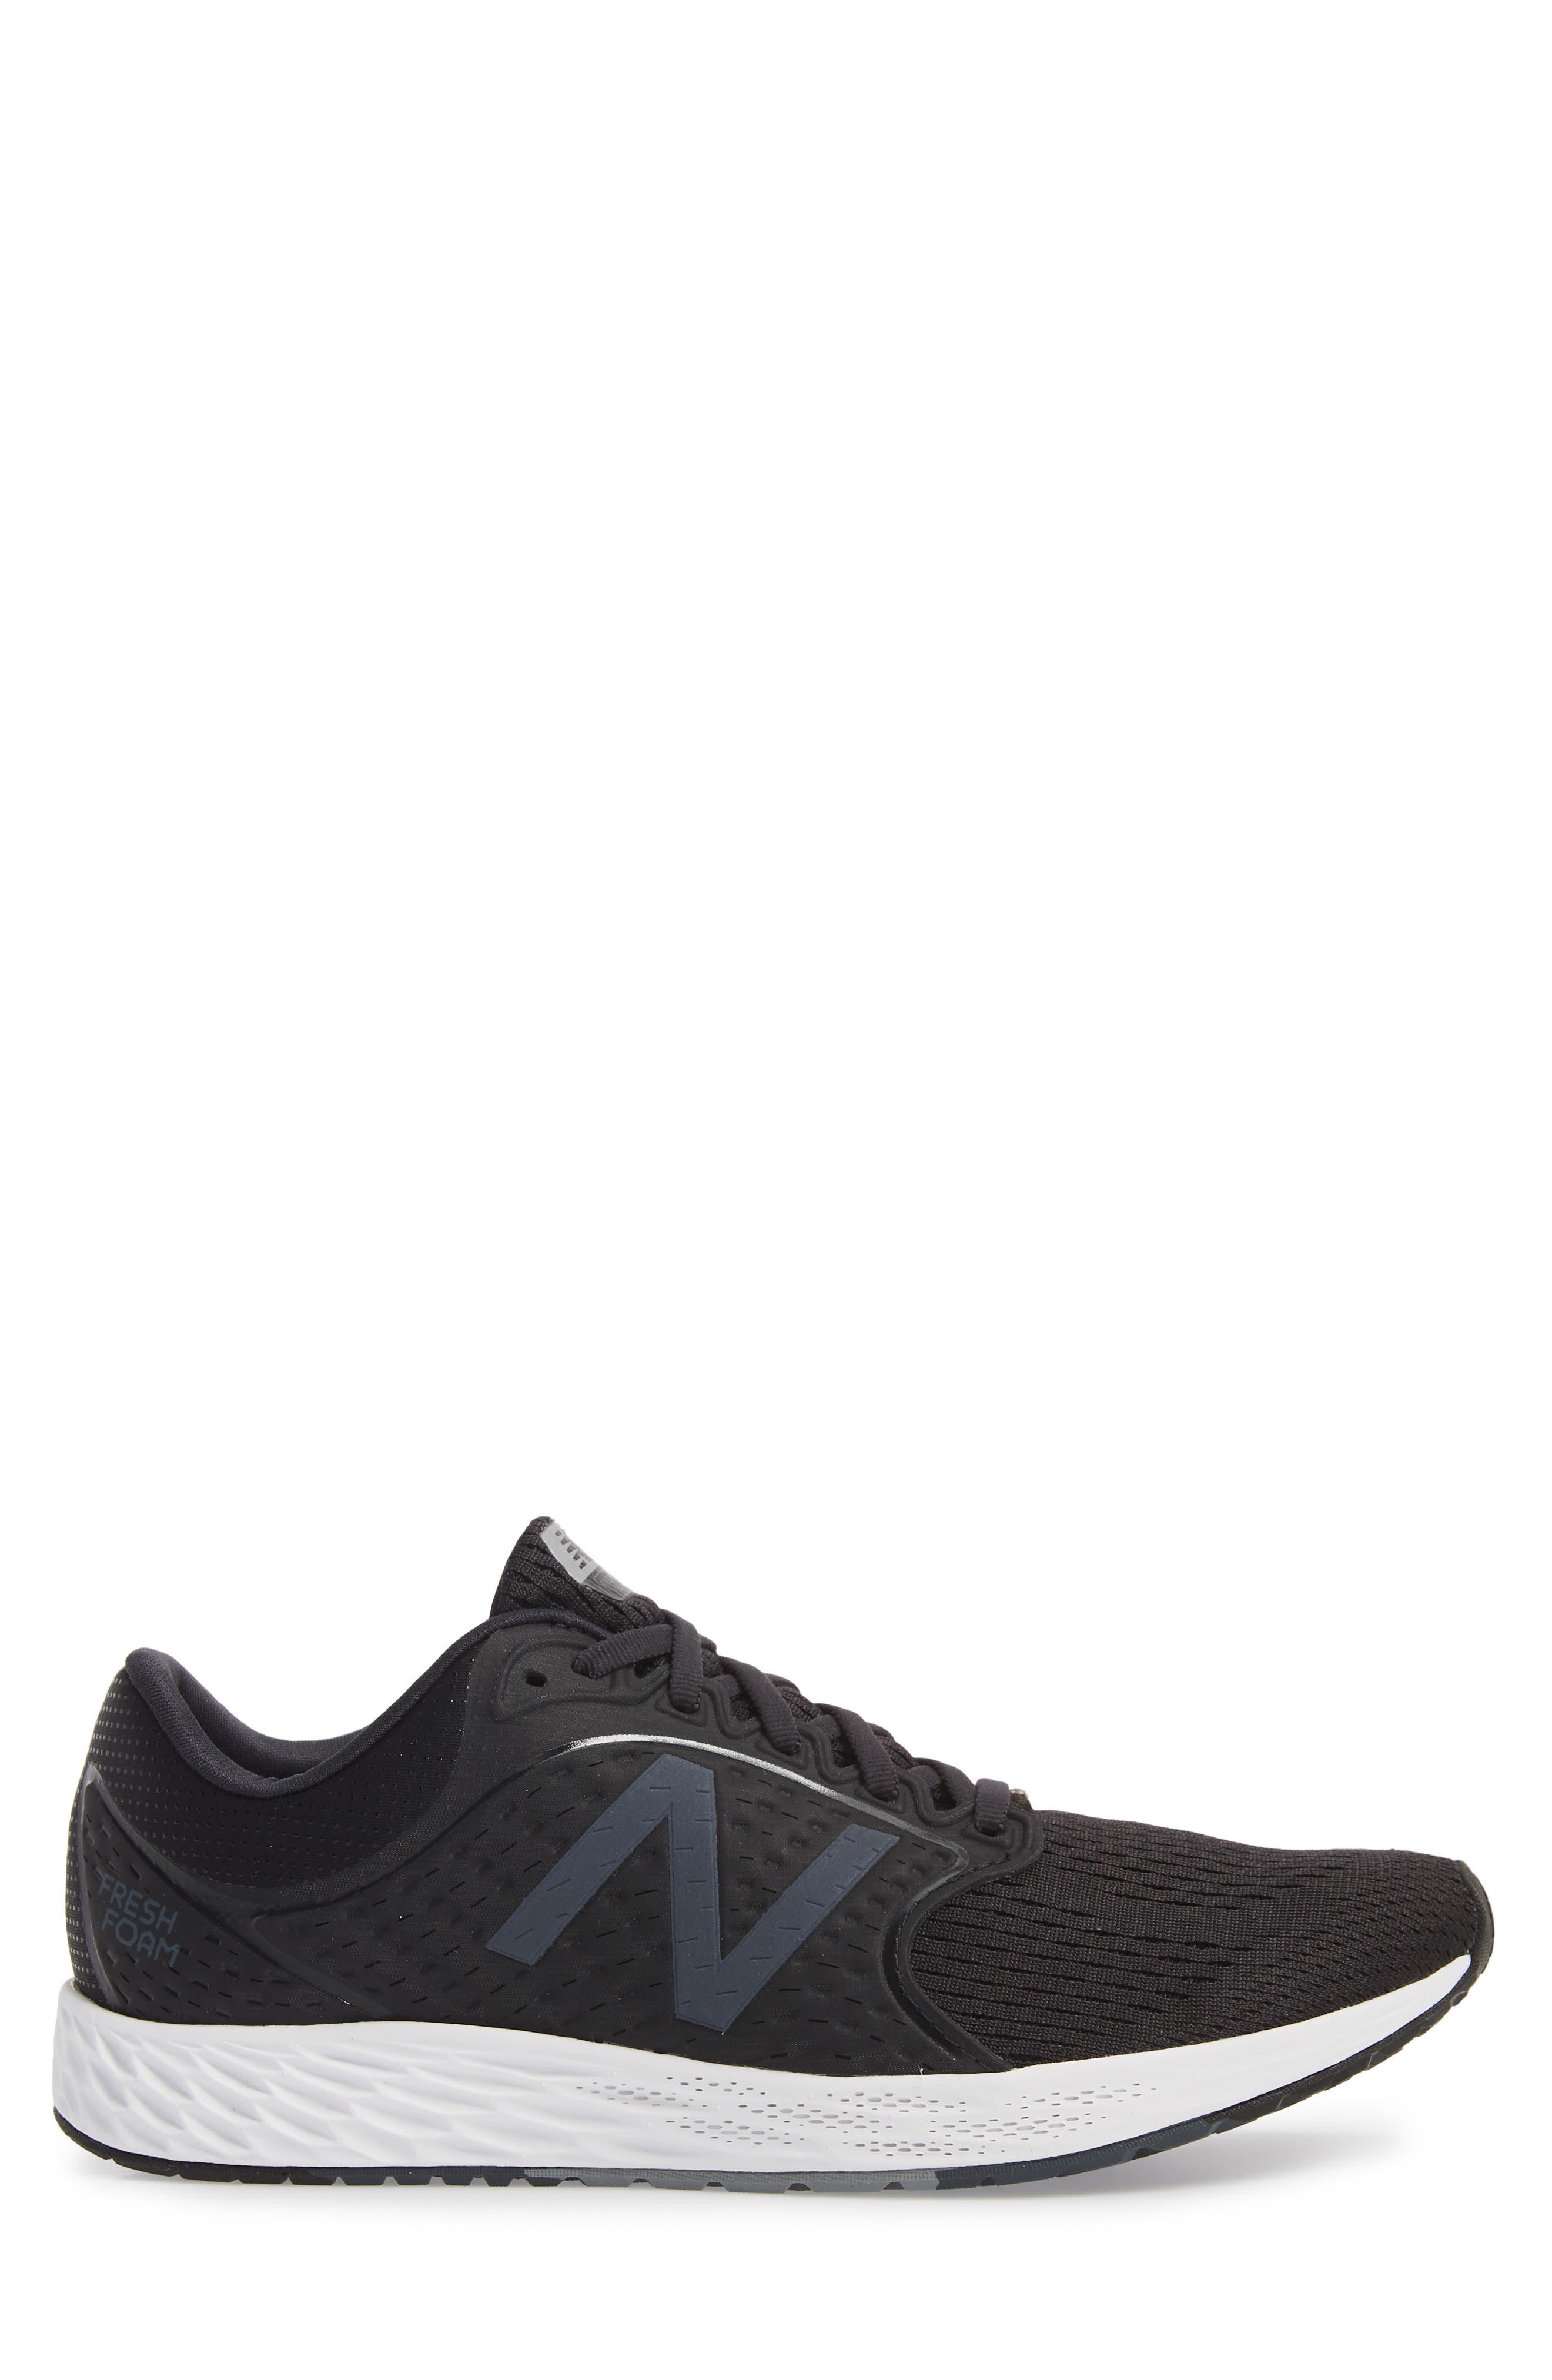 Fresh Foam Zante v4 Sneaker,                             Alternate thumbnail 3, color,                             BLACK